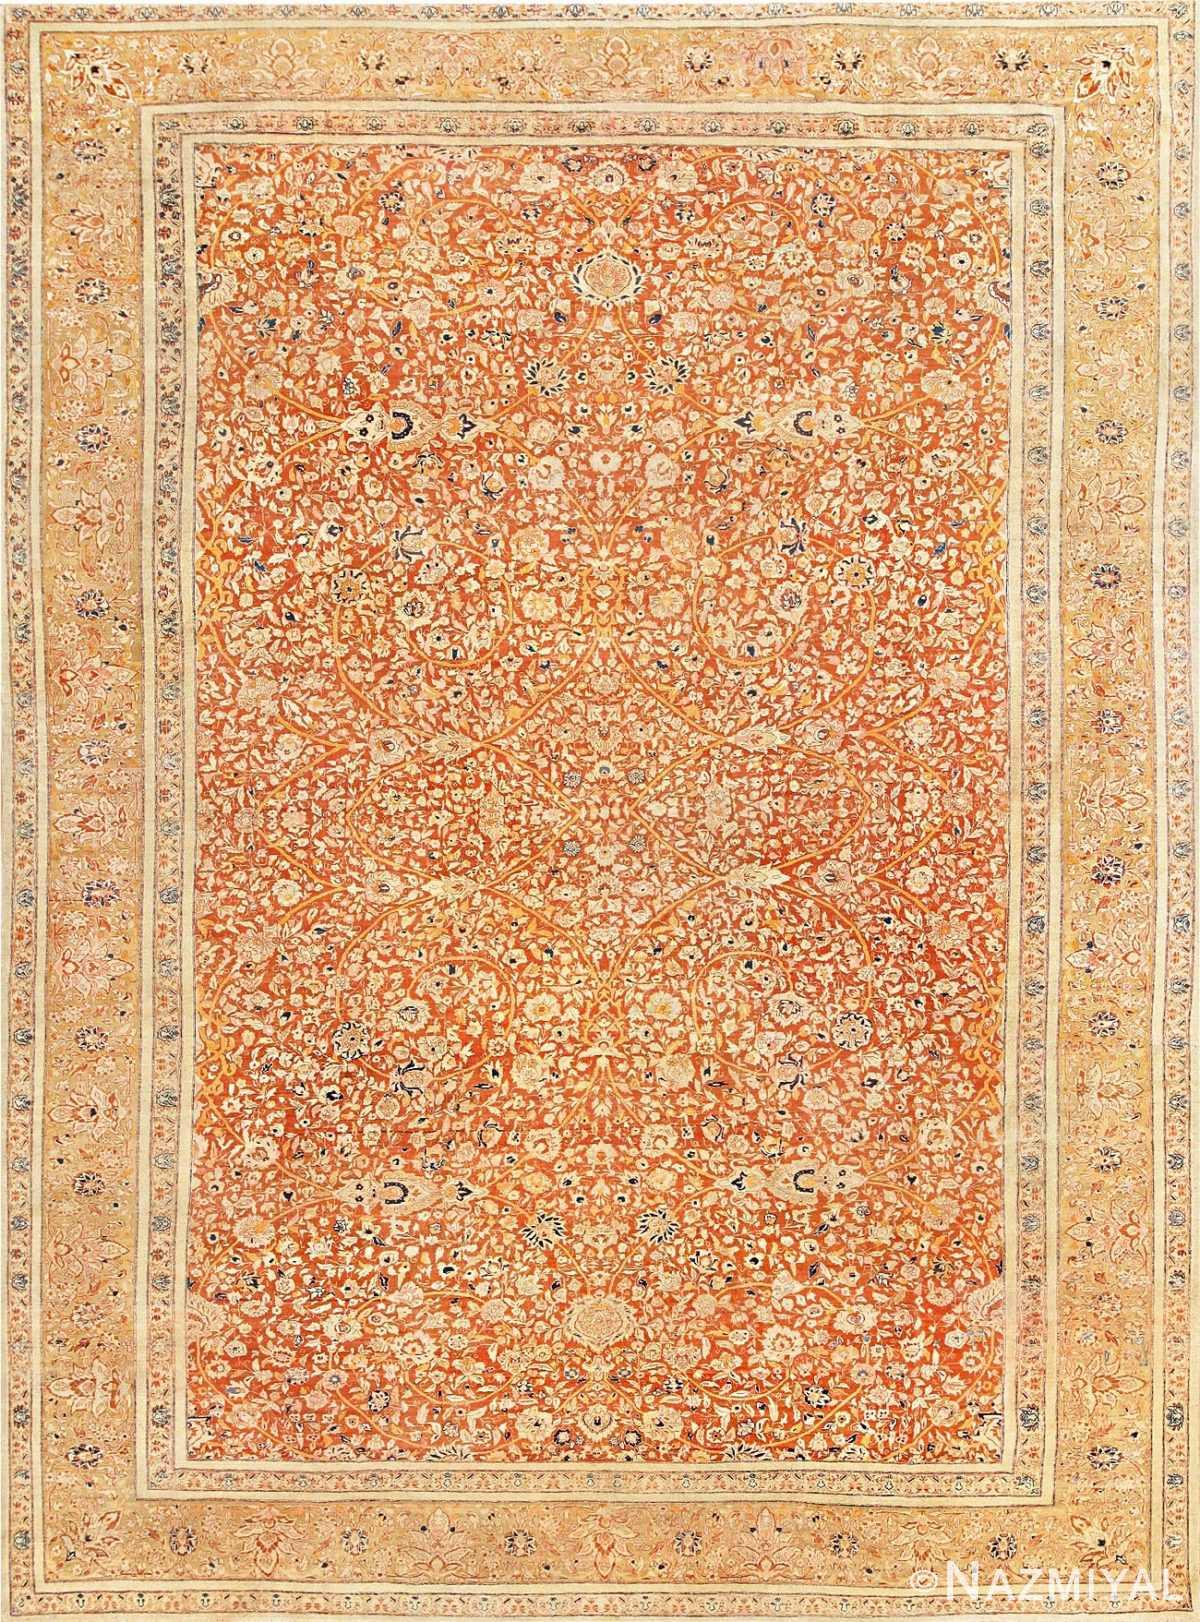 Antique Persian Tabriz Haji Jalili Carpet 47574 Detail/Large View